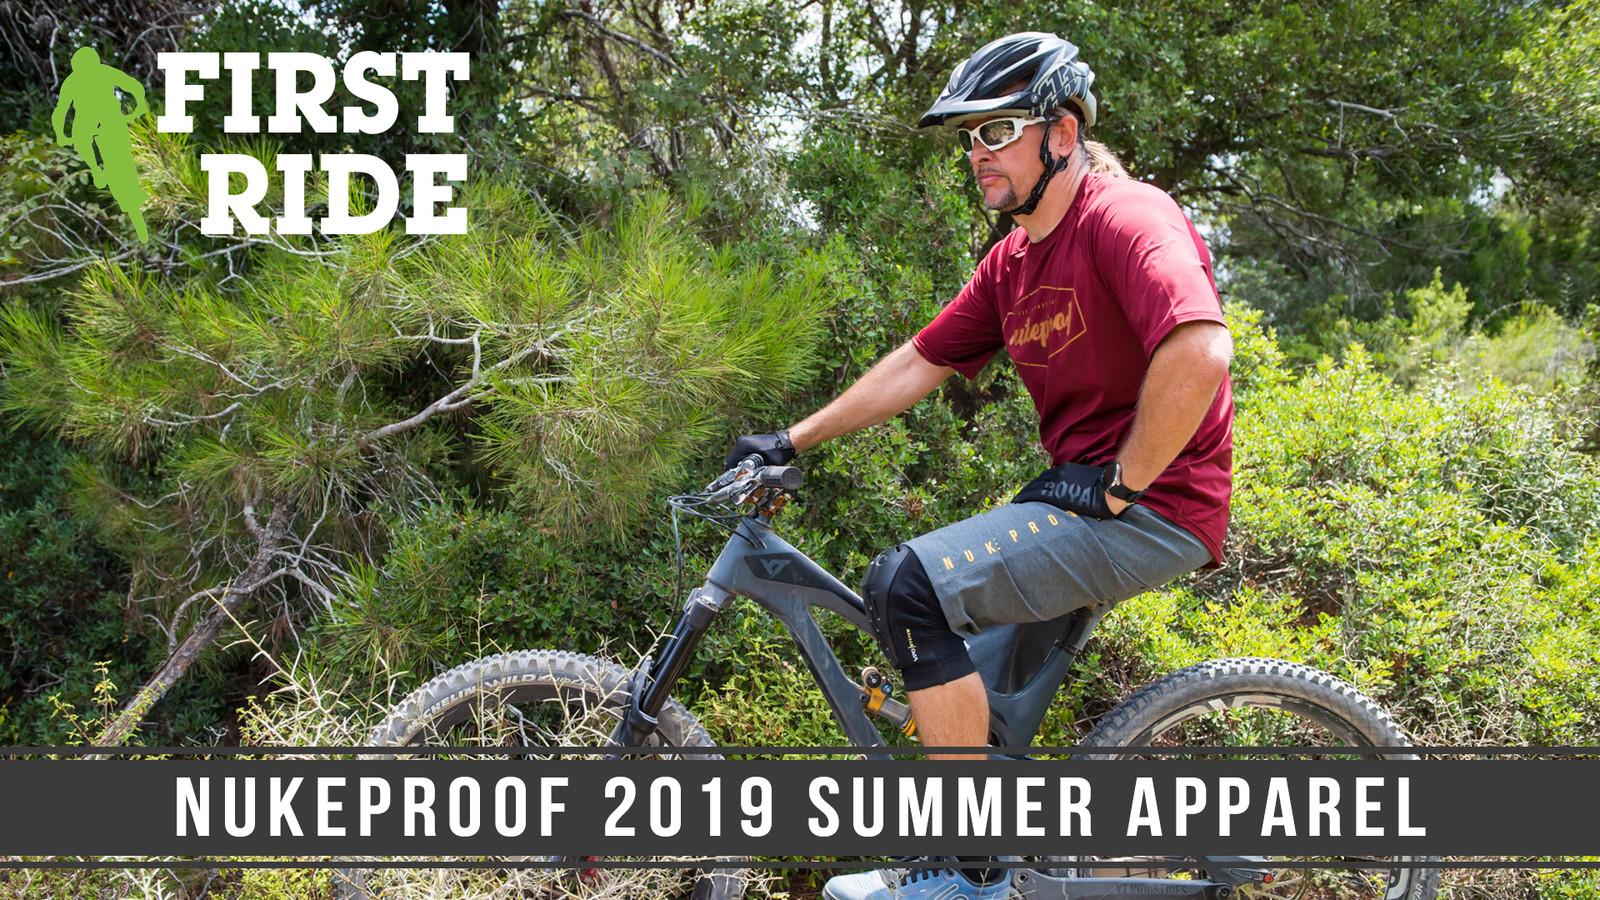 First Ride: Nukeproof 2019 Summer Apparel